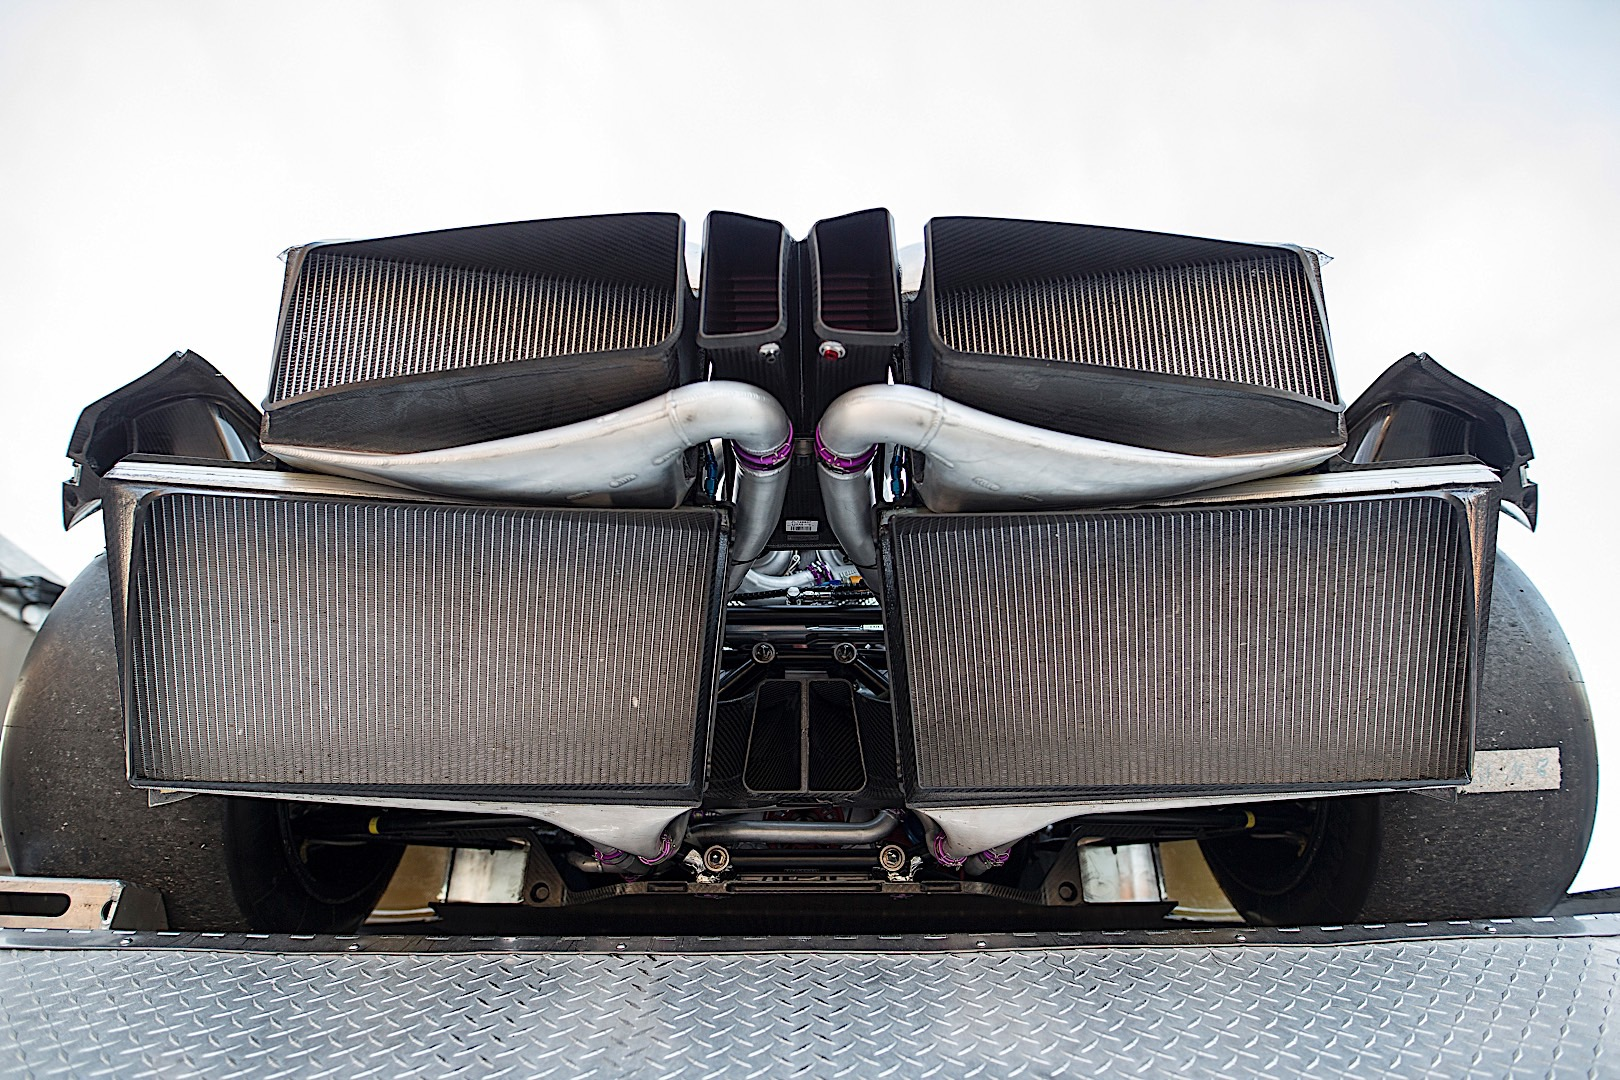 BMW P631 engine